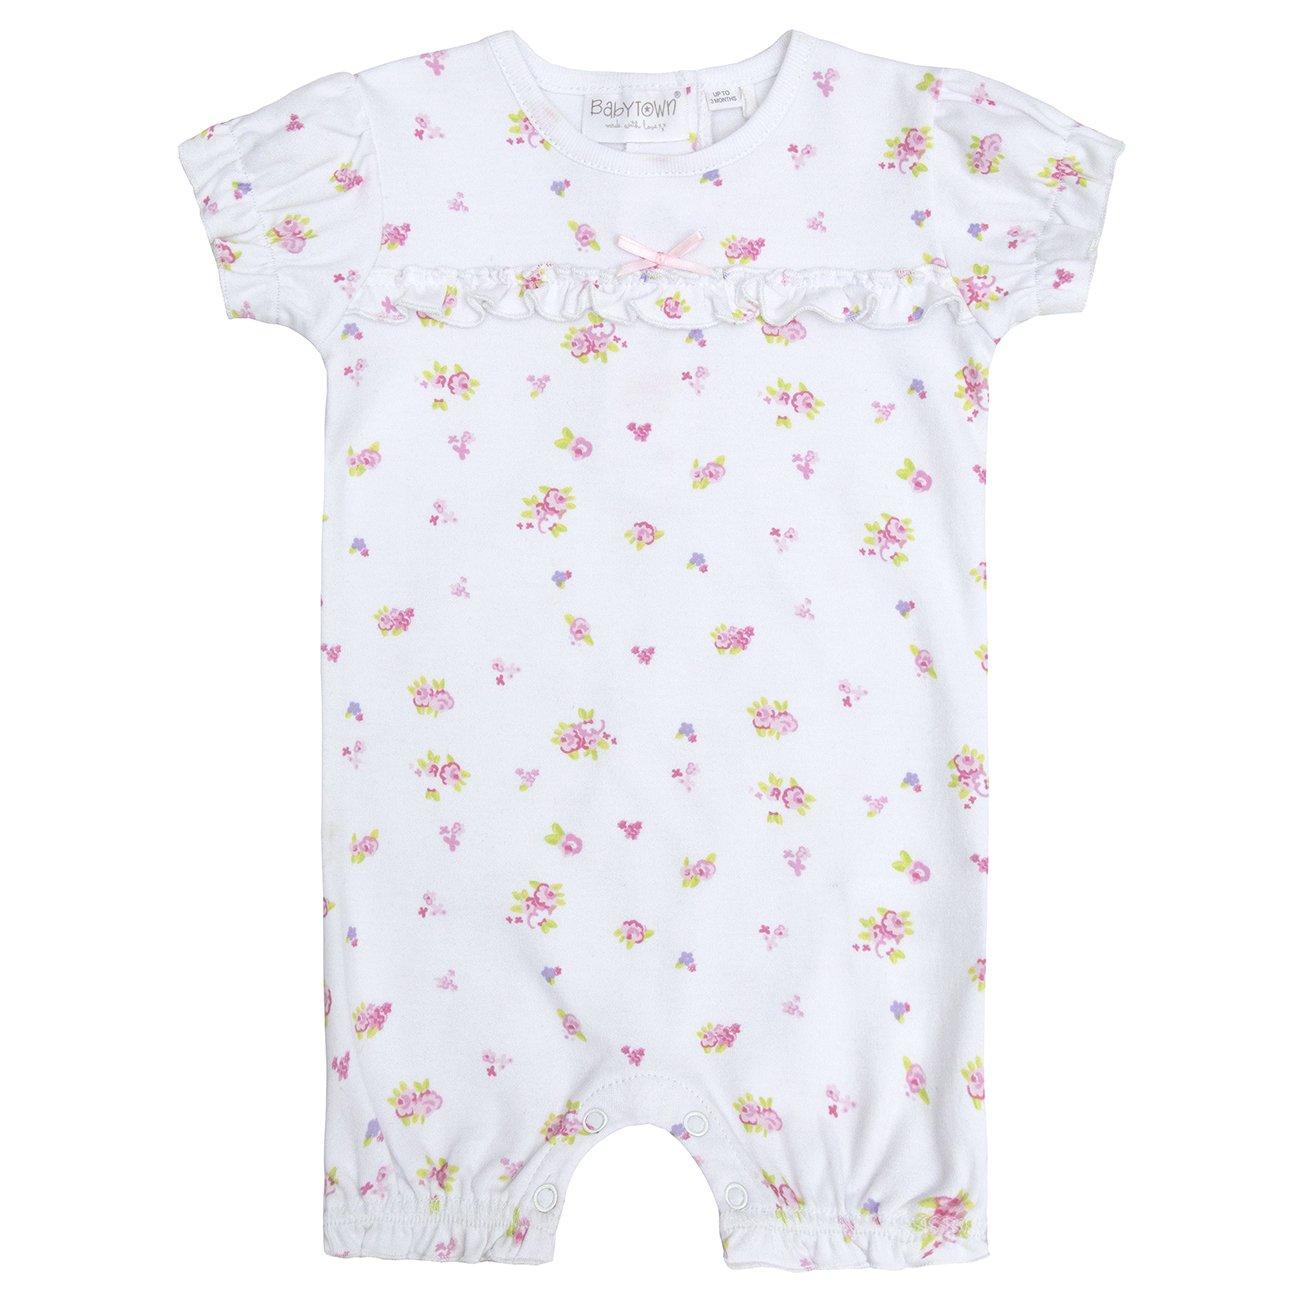 BABY TOWN Babytown Baby Girls Romper Suit